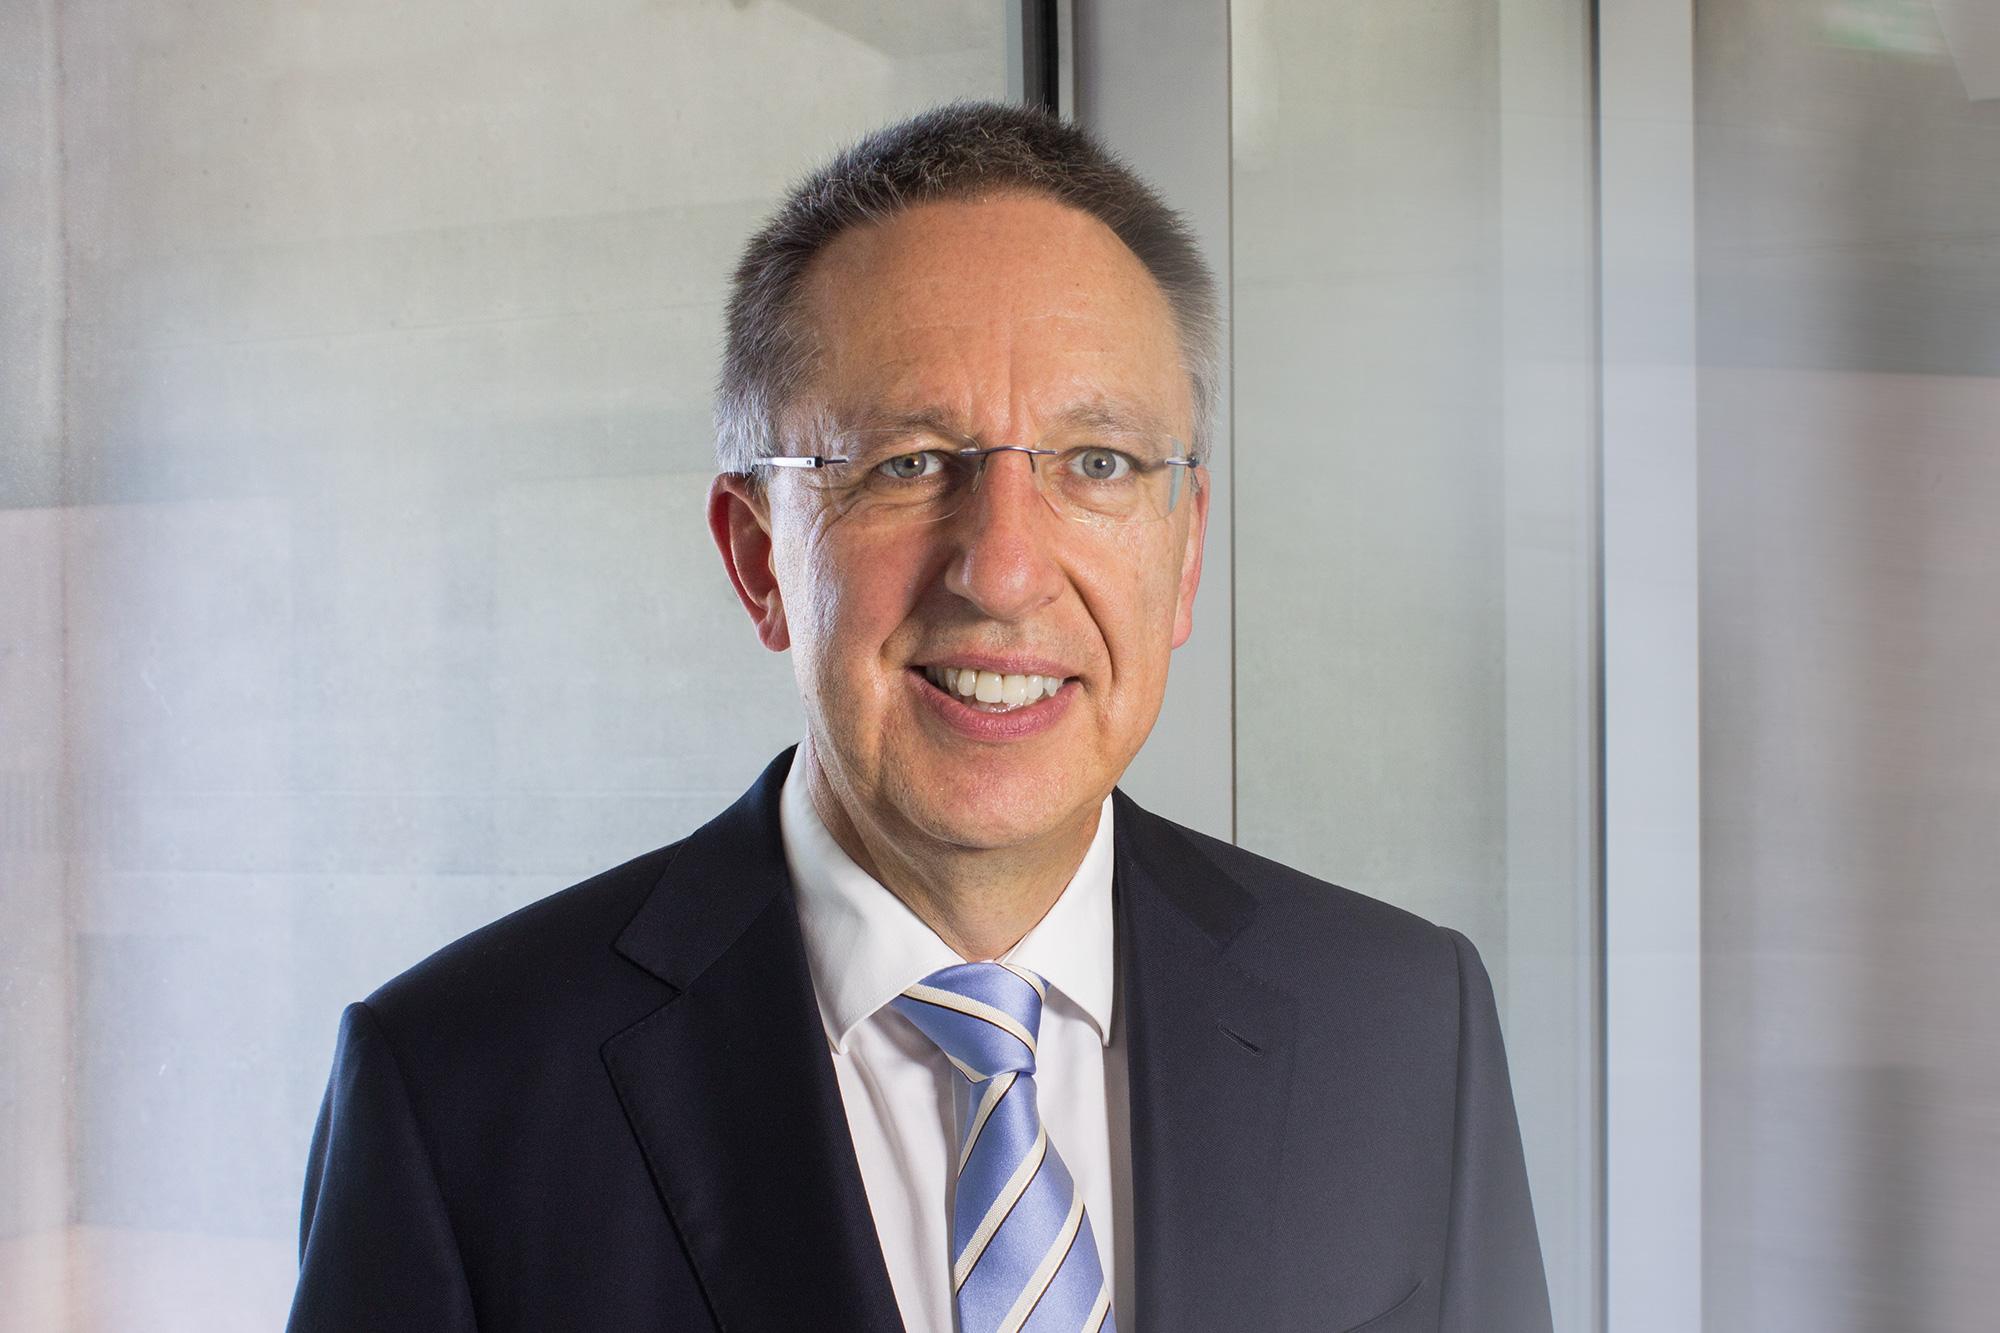 Prof. Dr. Klaus M. Kohlöffel